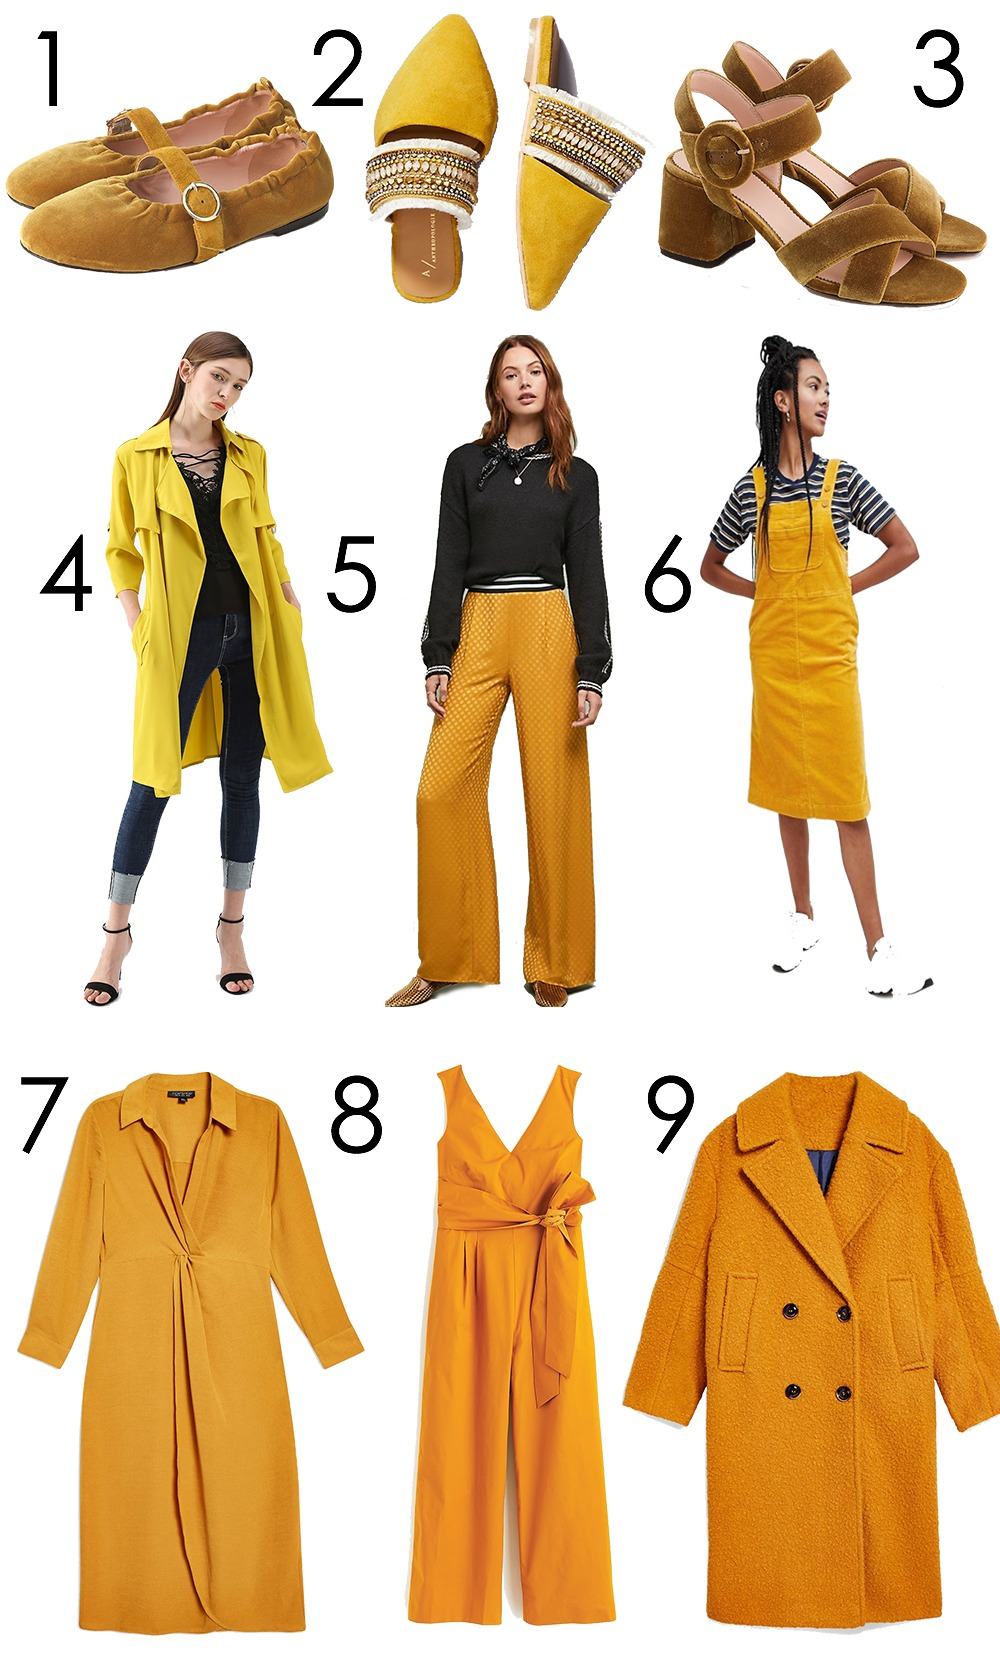 Yellow Fall Fashion Trend Picks for Your Wardrobe I DreaminLace.com #FallFashion #FallTrends #Style